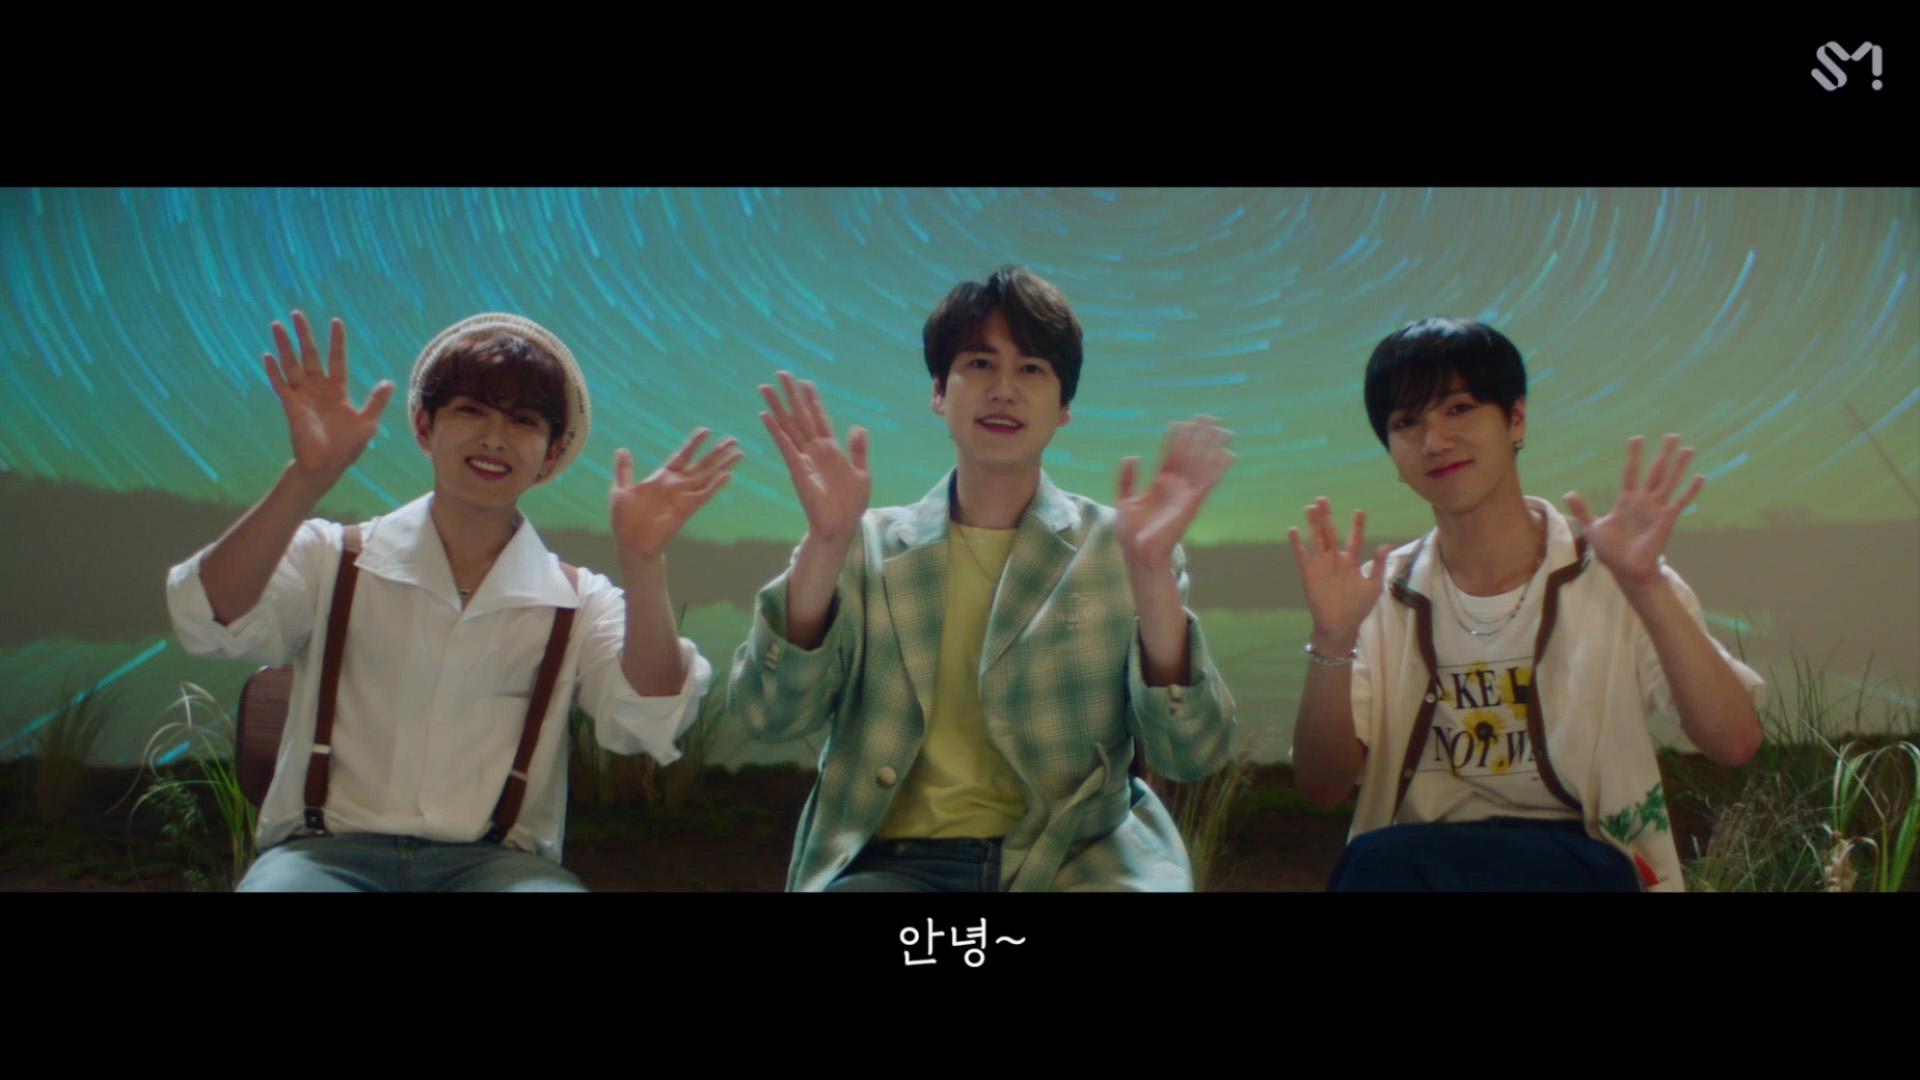 [STATION] K 규현 R 려욱 Y 예성의 별을 노래하는 시간✨ #비하인더스테이션